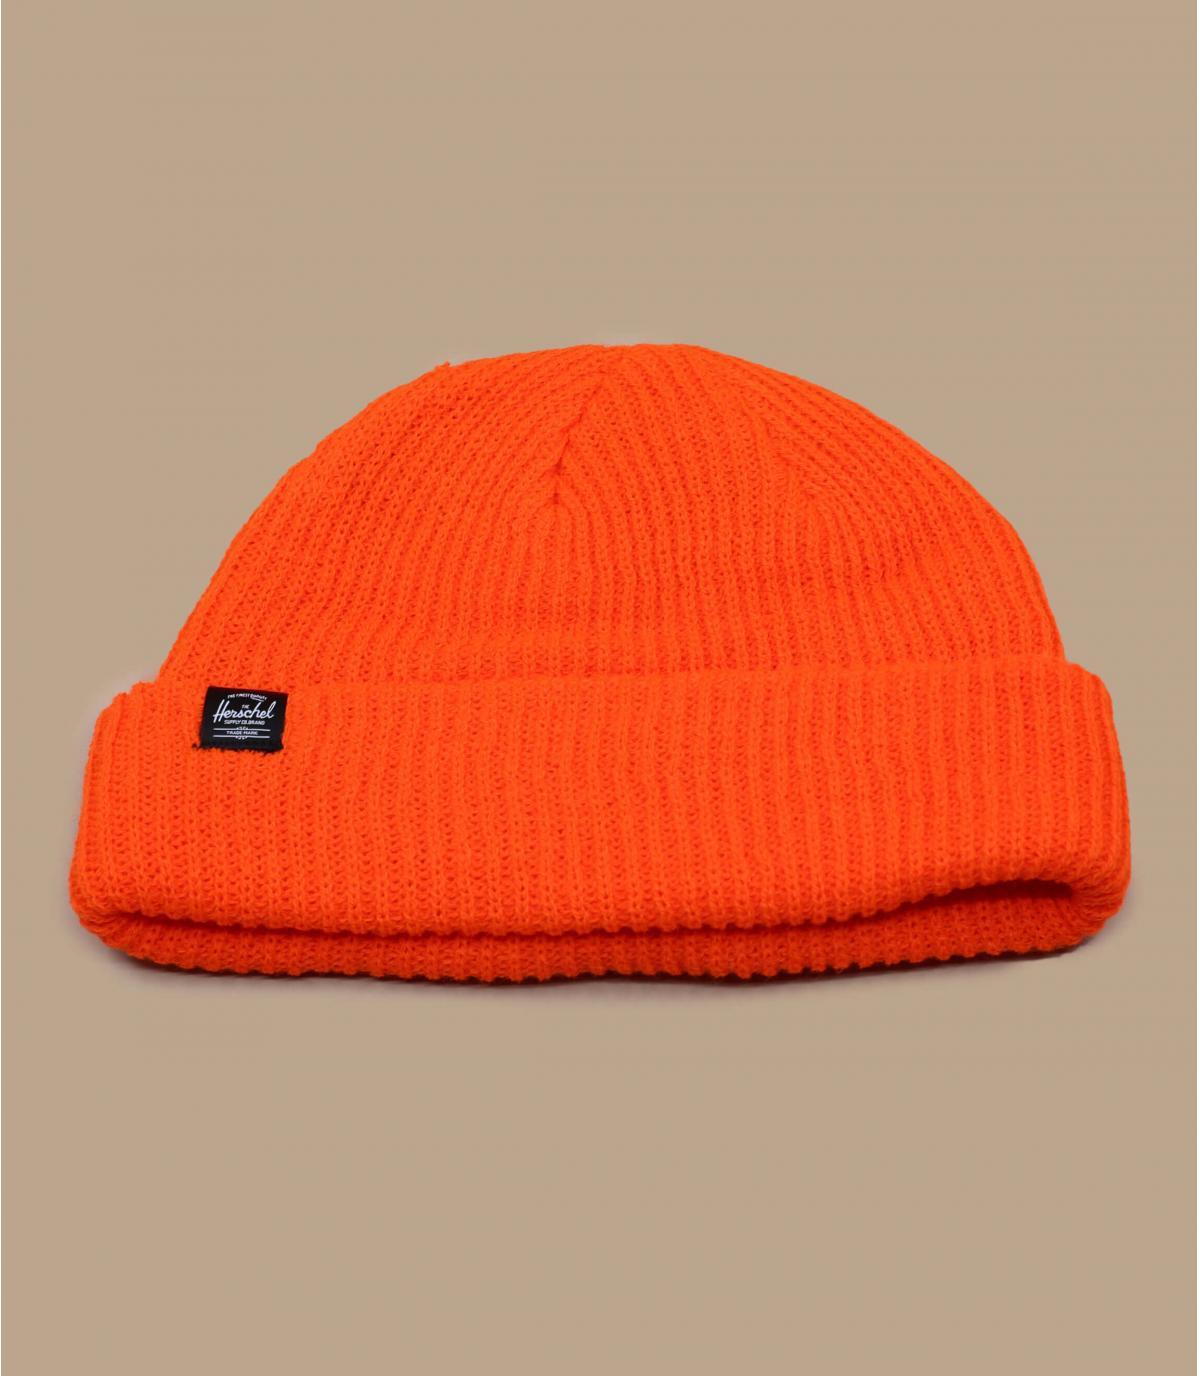 bonnet docker Herschel orange